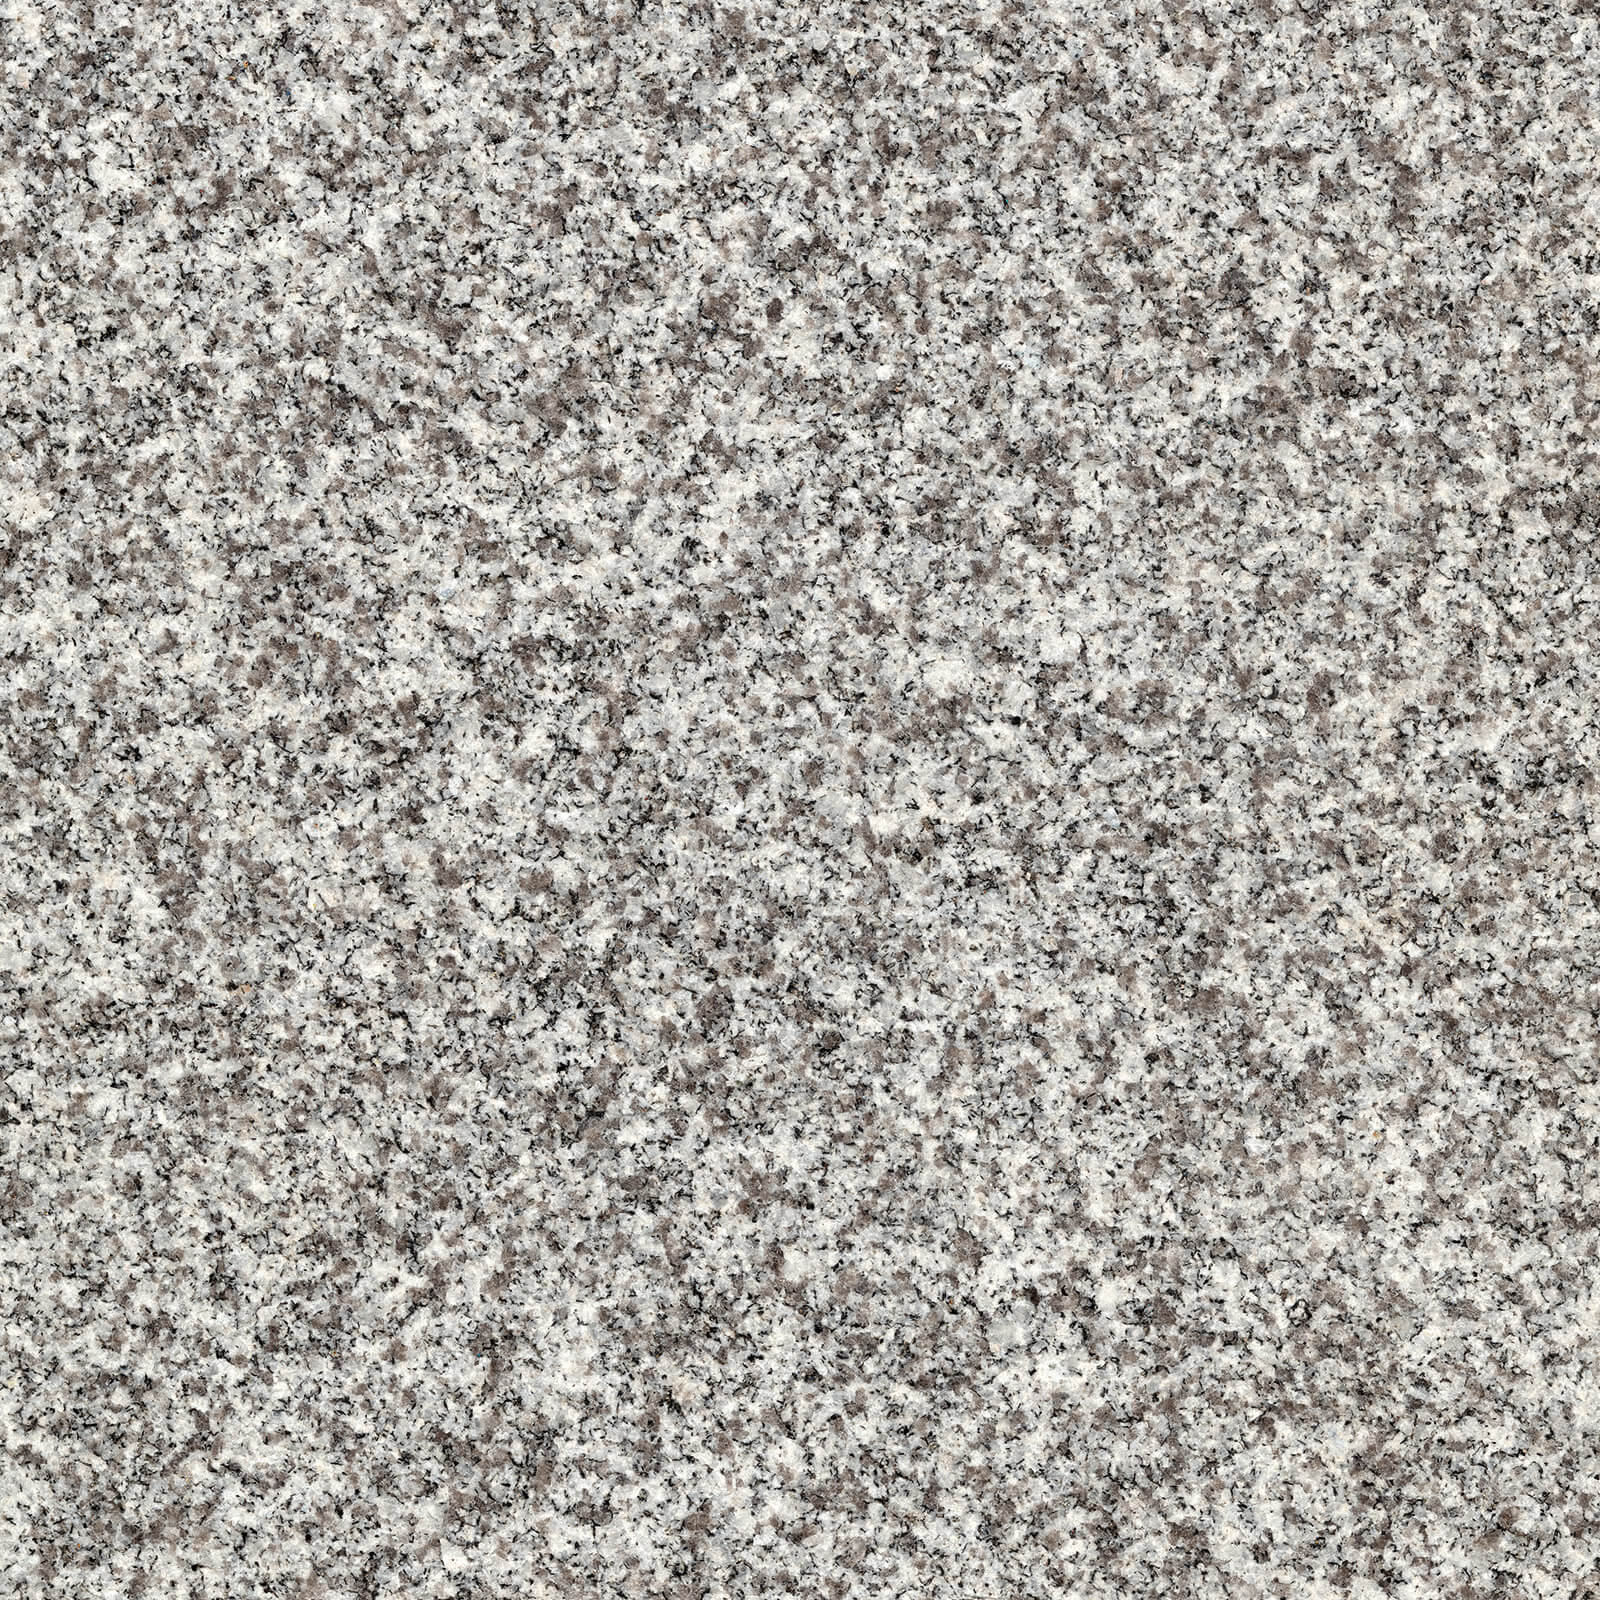 Woodbury Gray Structural Stone Llc